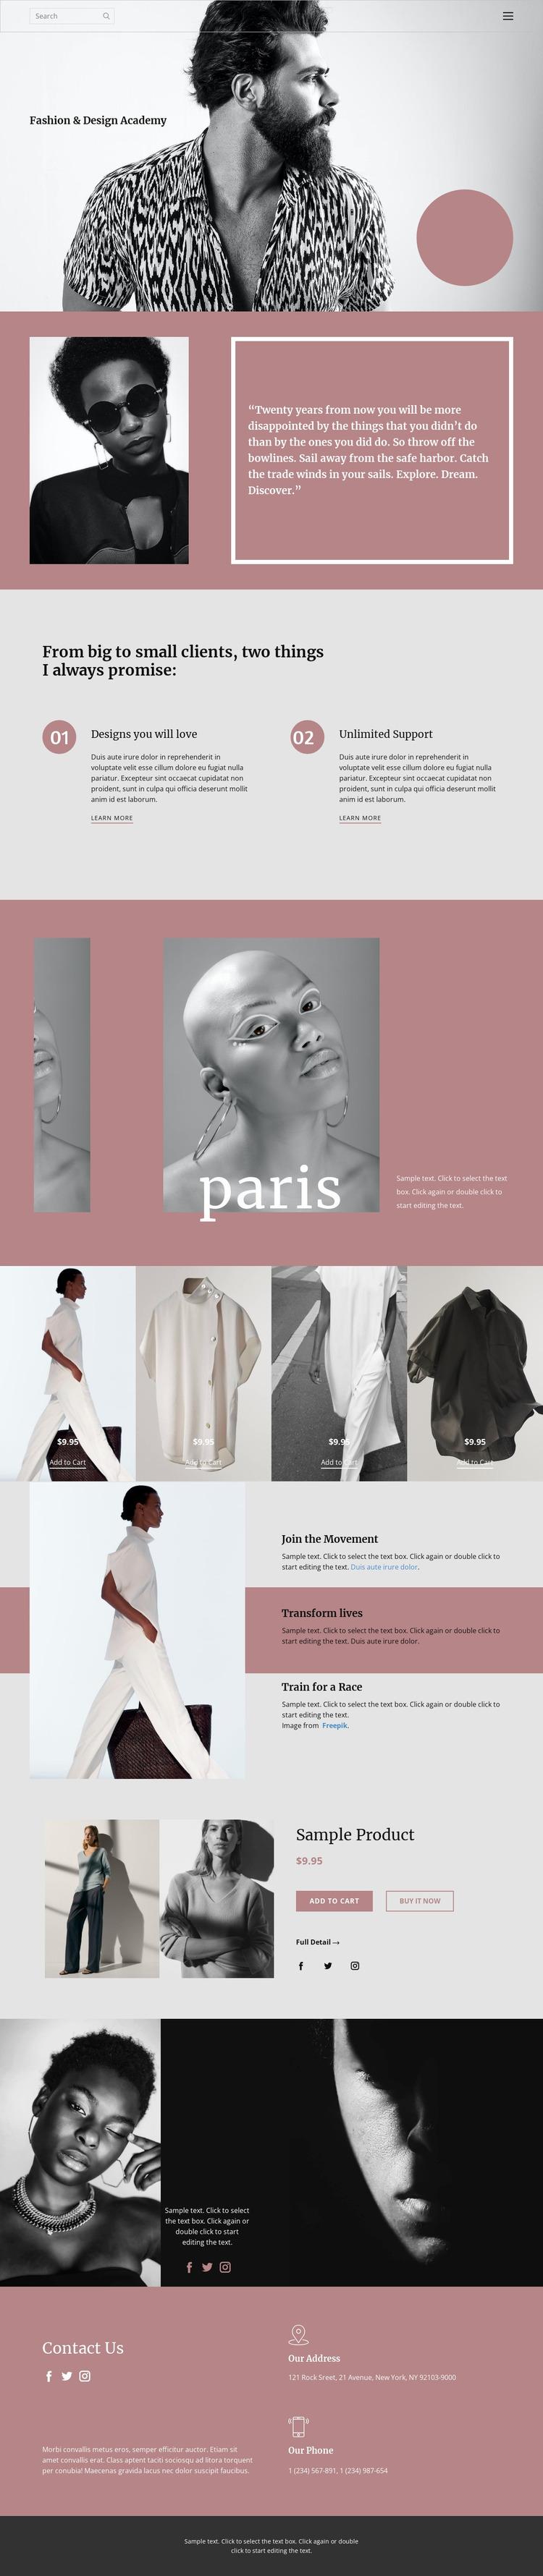 Fashion studio Website Mockup